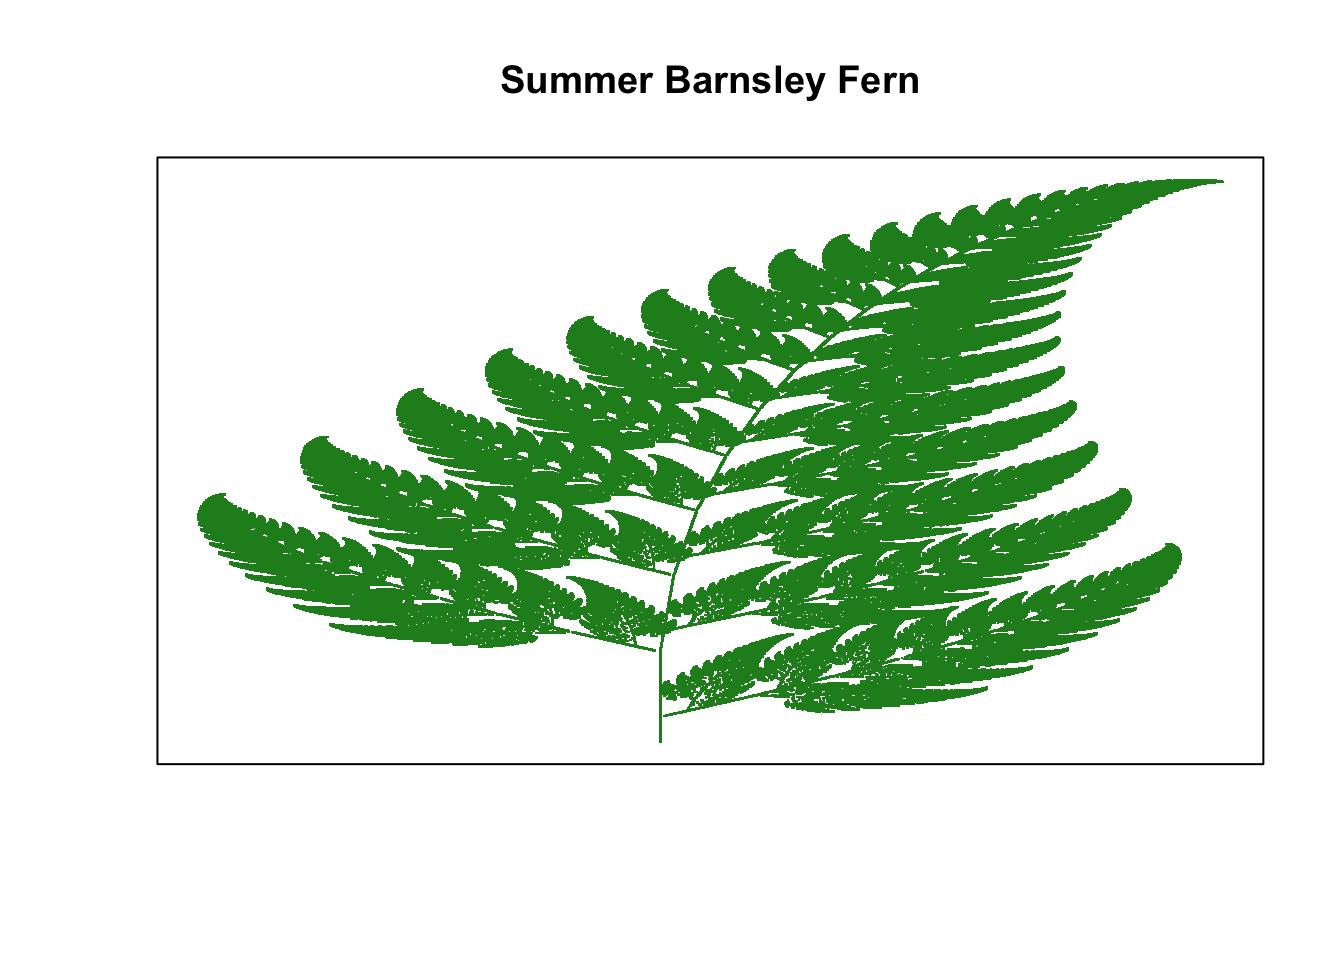 Autumn Barnsley Fern